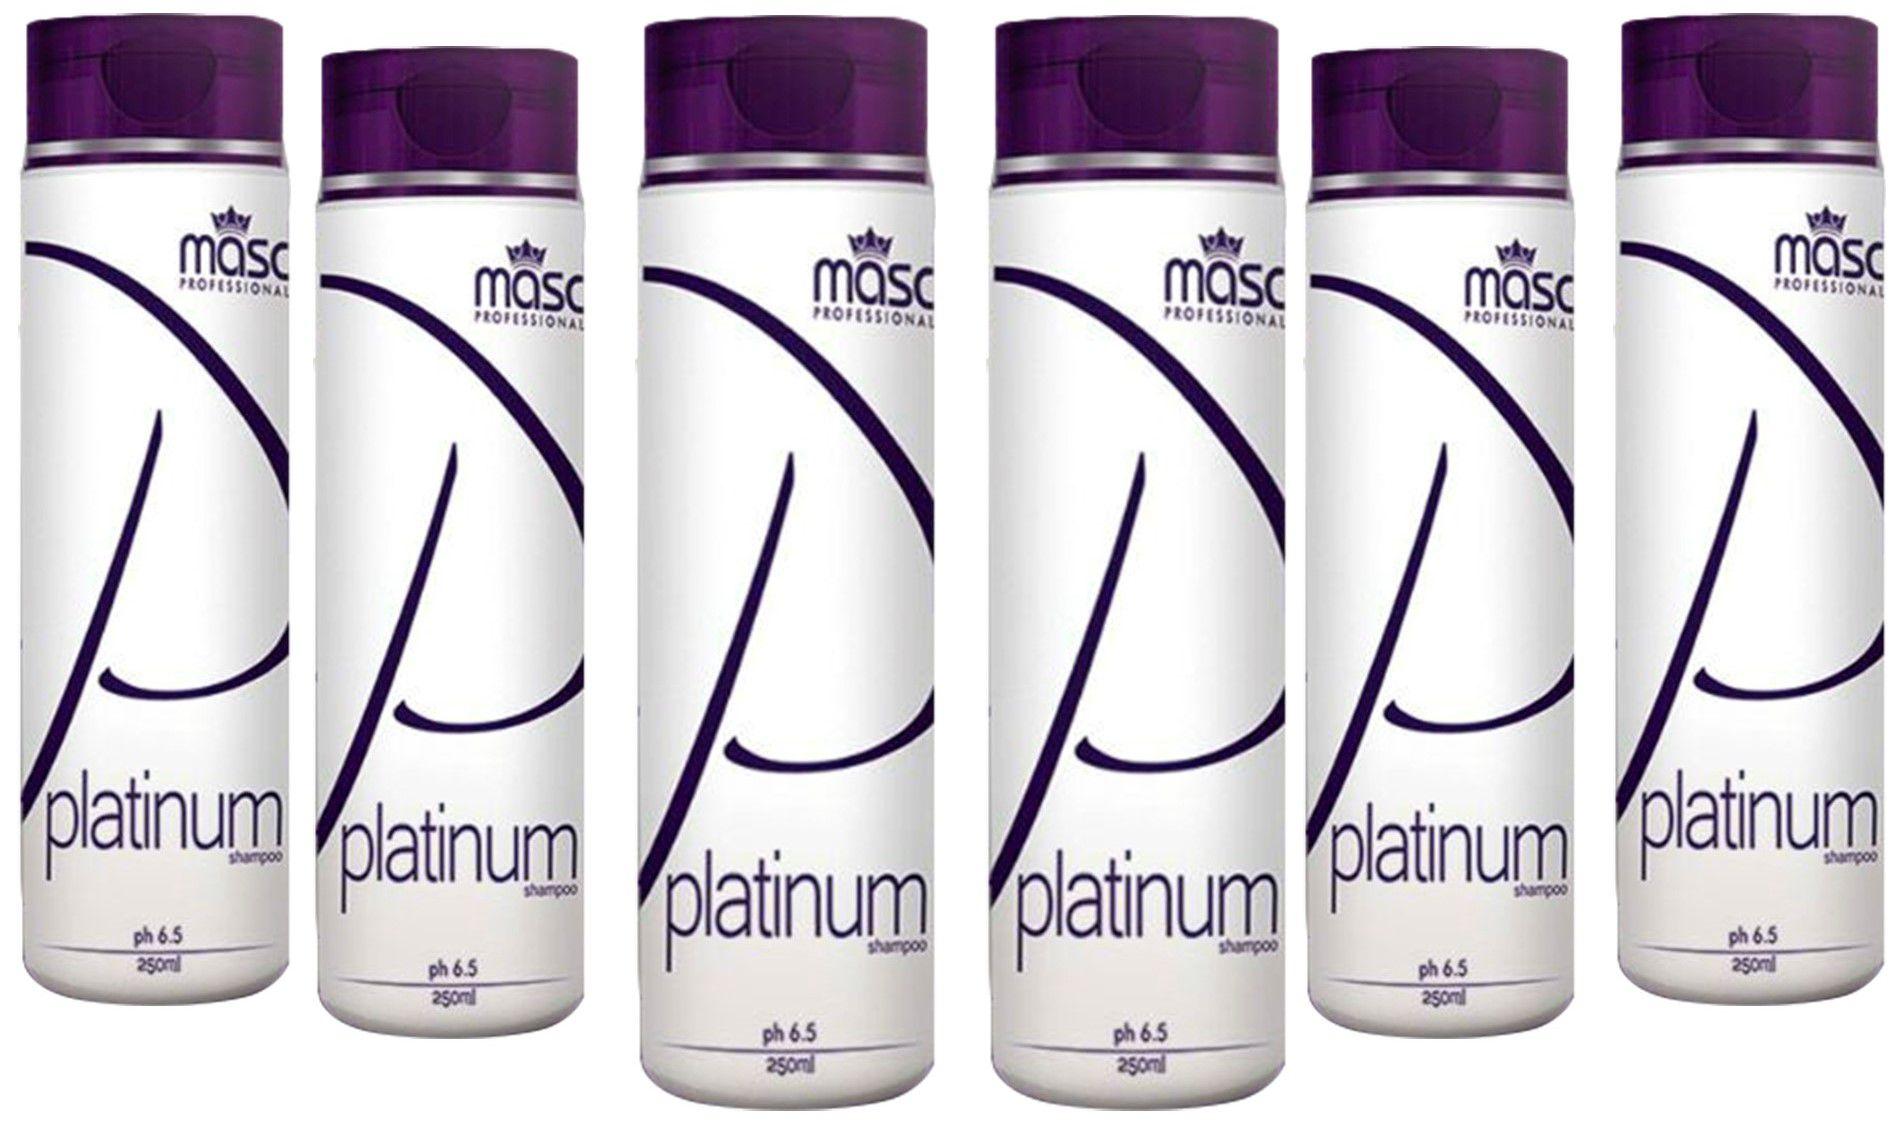 Shampoo Platinum Masc Professional 250g - 6 Unidades